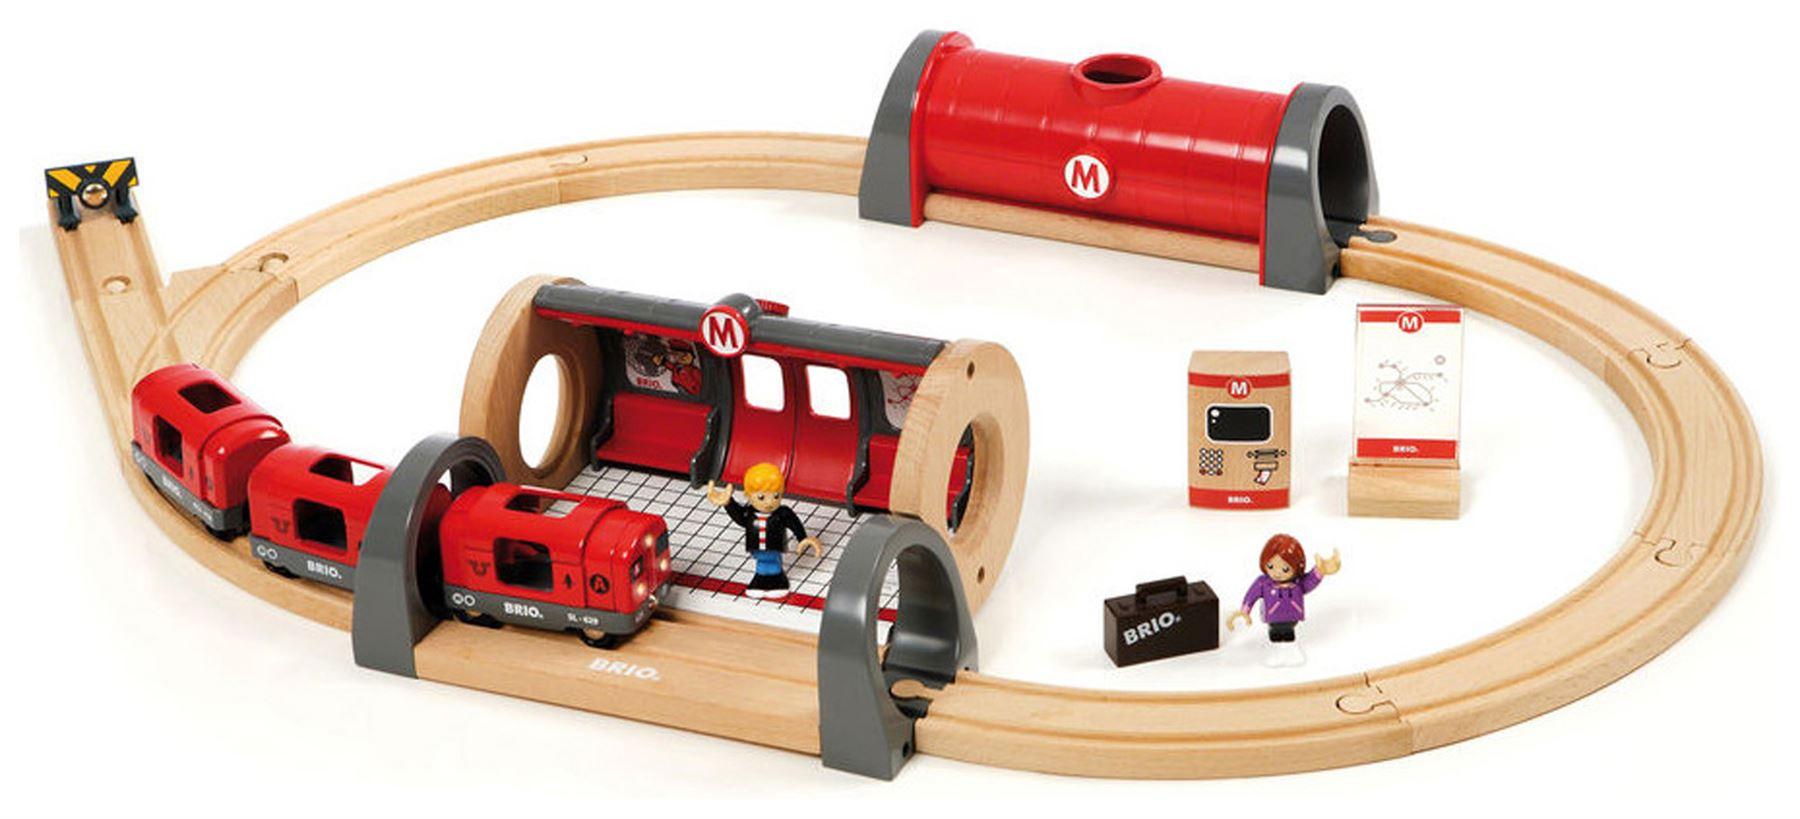 details about brio metro railway set wooden toy train - new